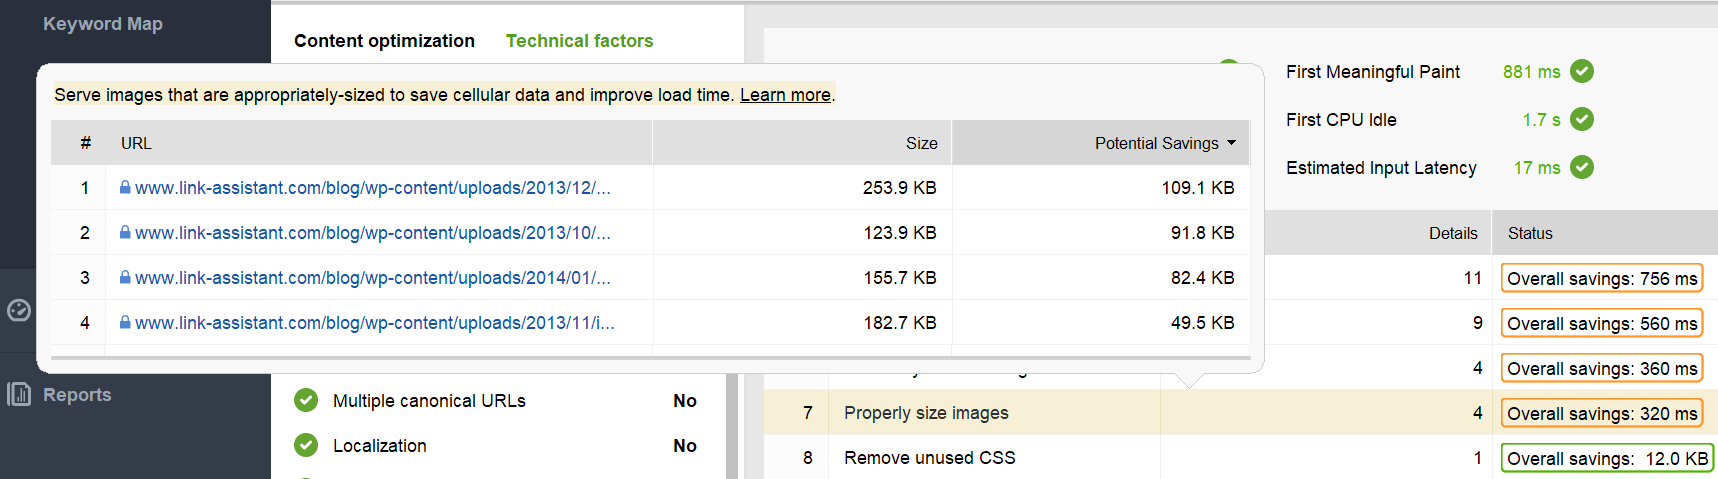 List of URLs that need optimization